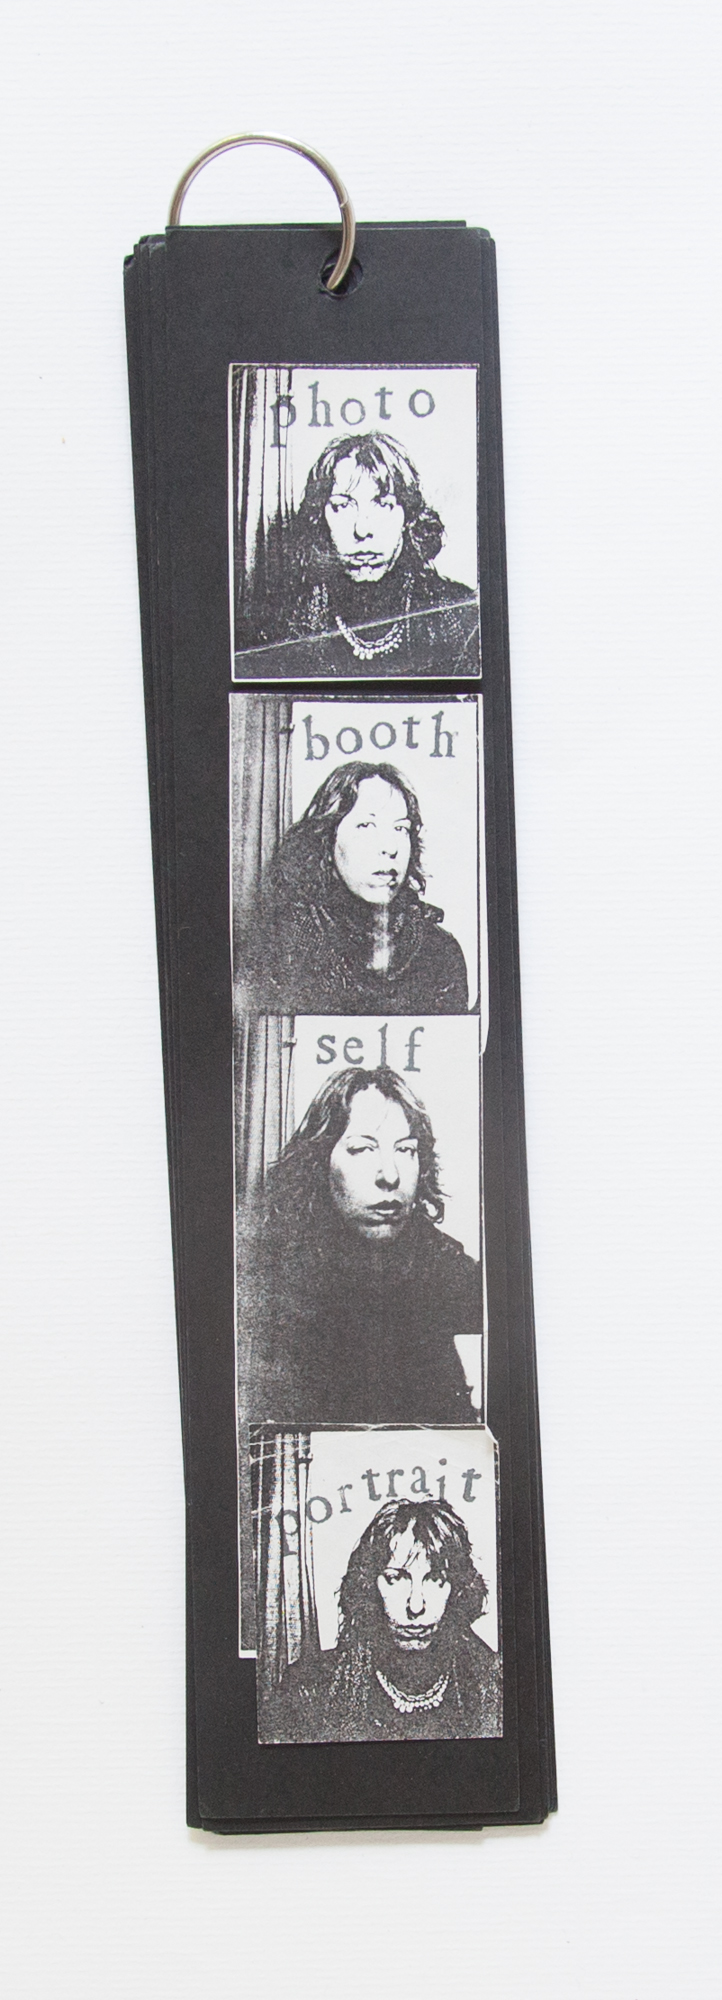 188_Photo Booth Self-Portraits (1988)_.jpg